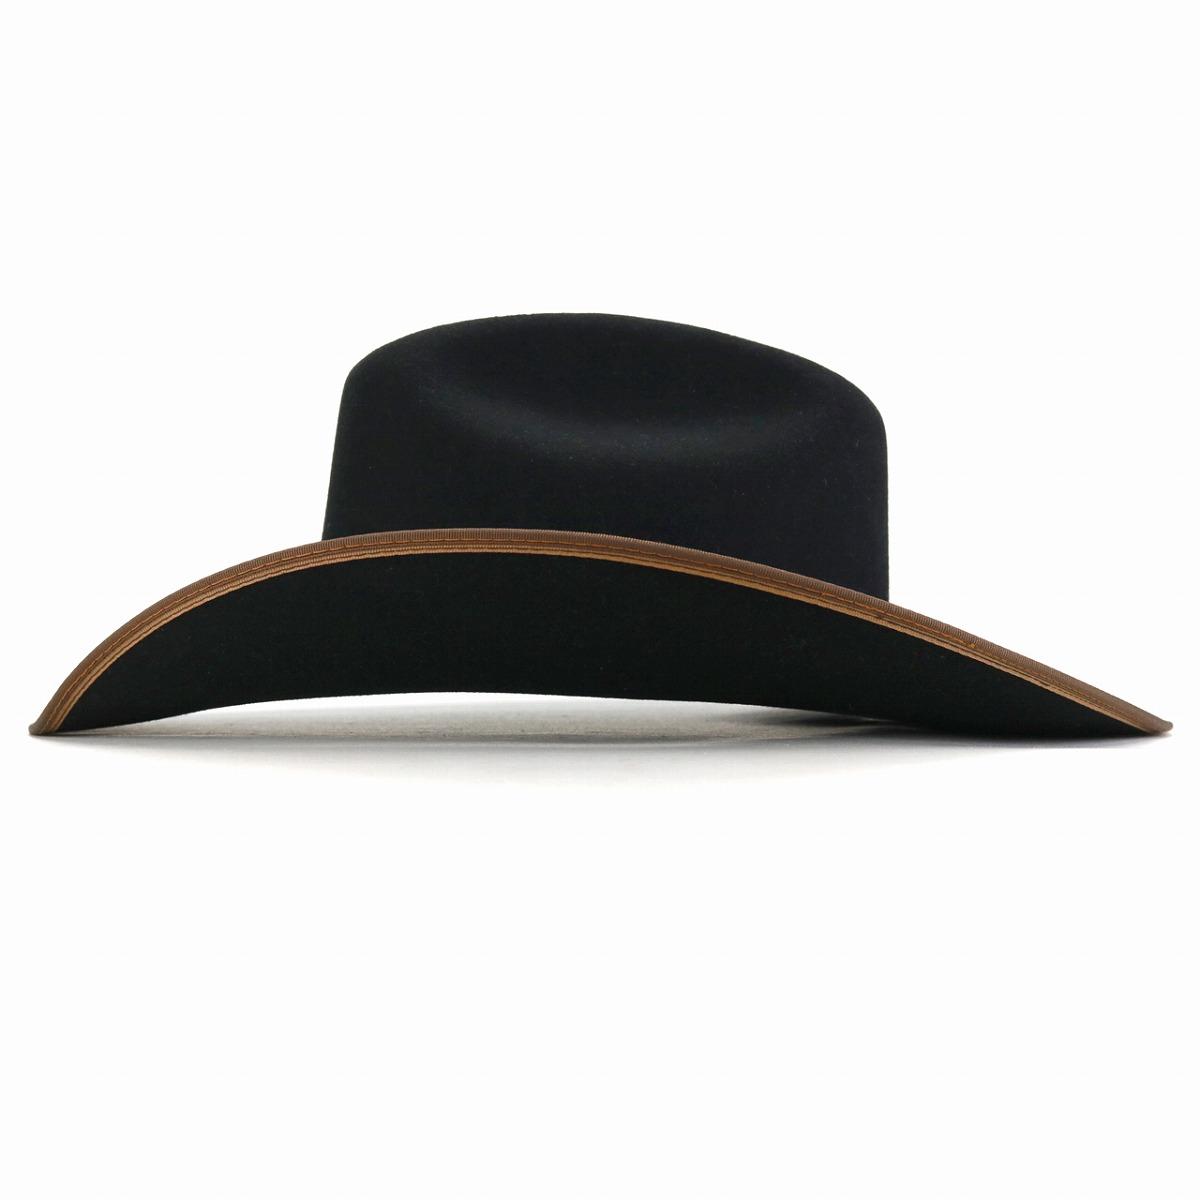 234ed5f38a709 ELEHELM HAT STORE  STETSON western hat United States brand gentleman ...